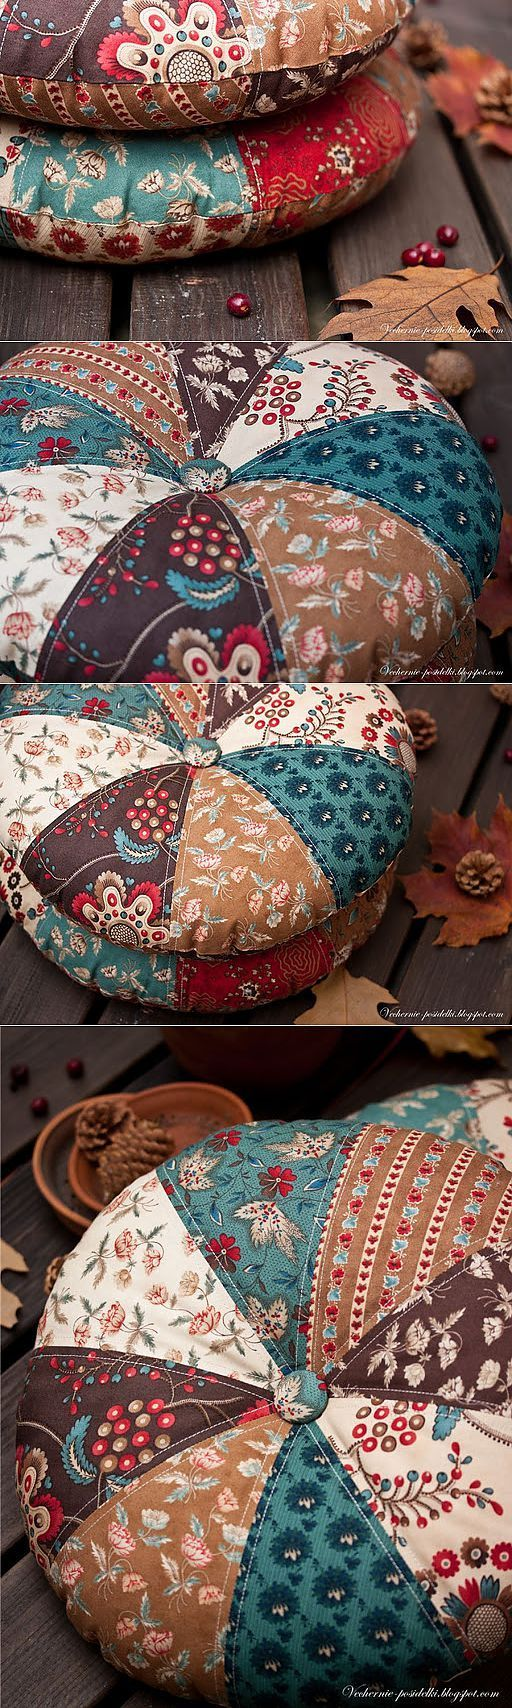 almofada redonda / travesseiros redondas - serões